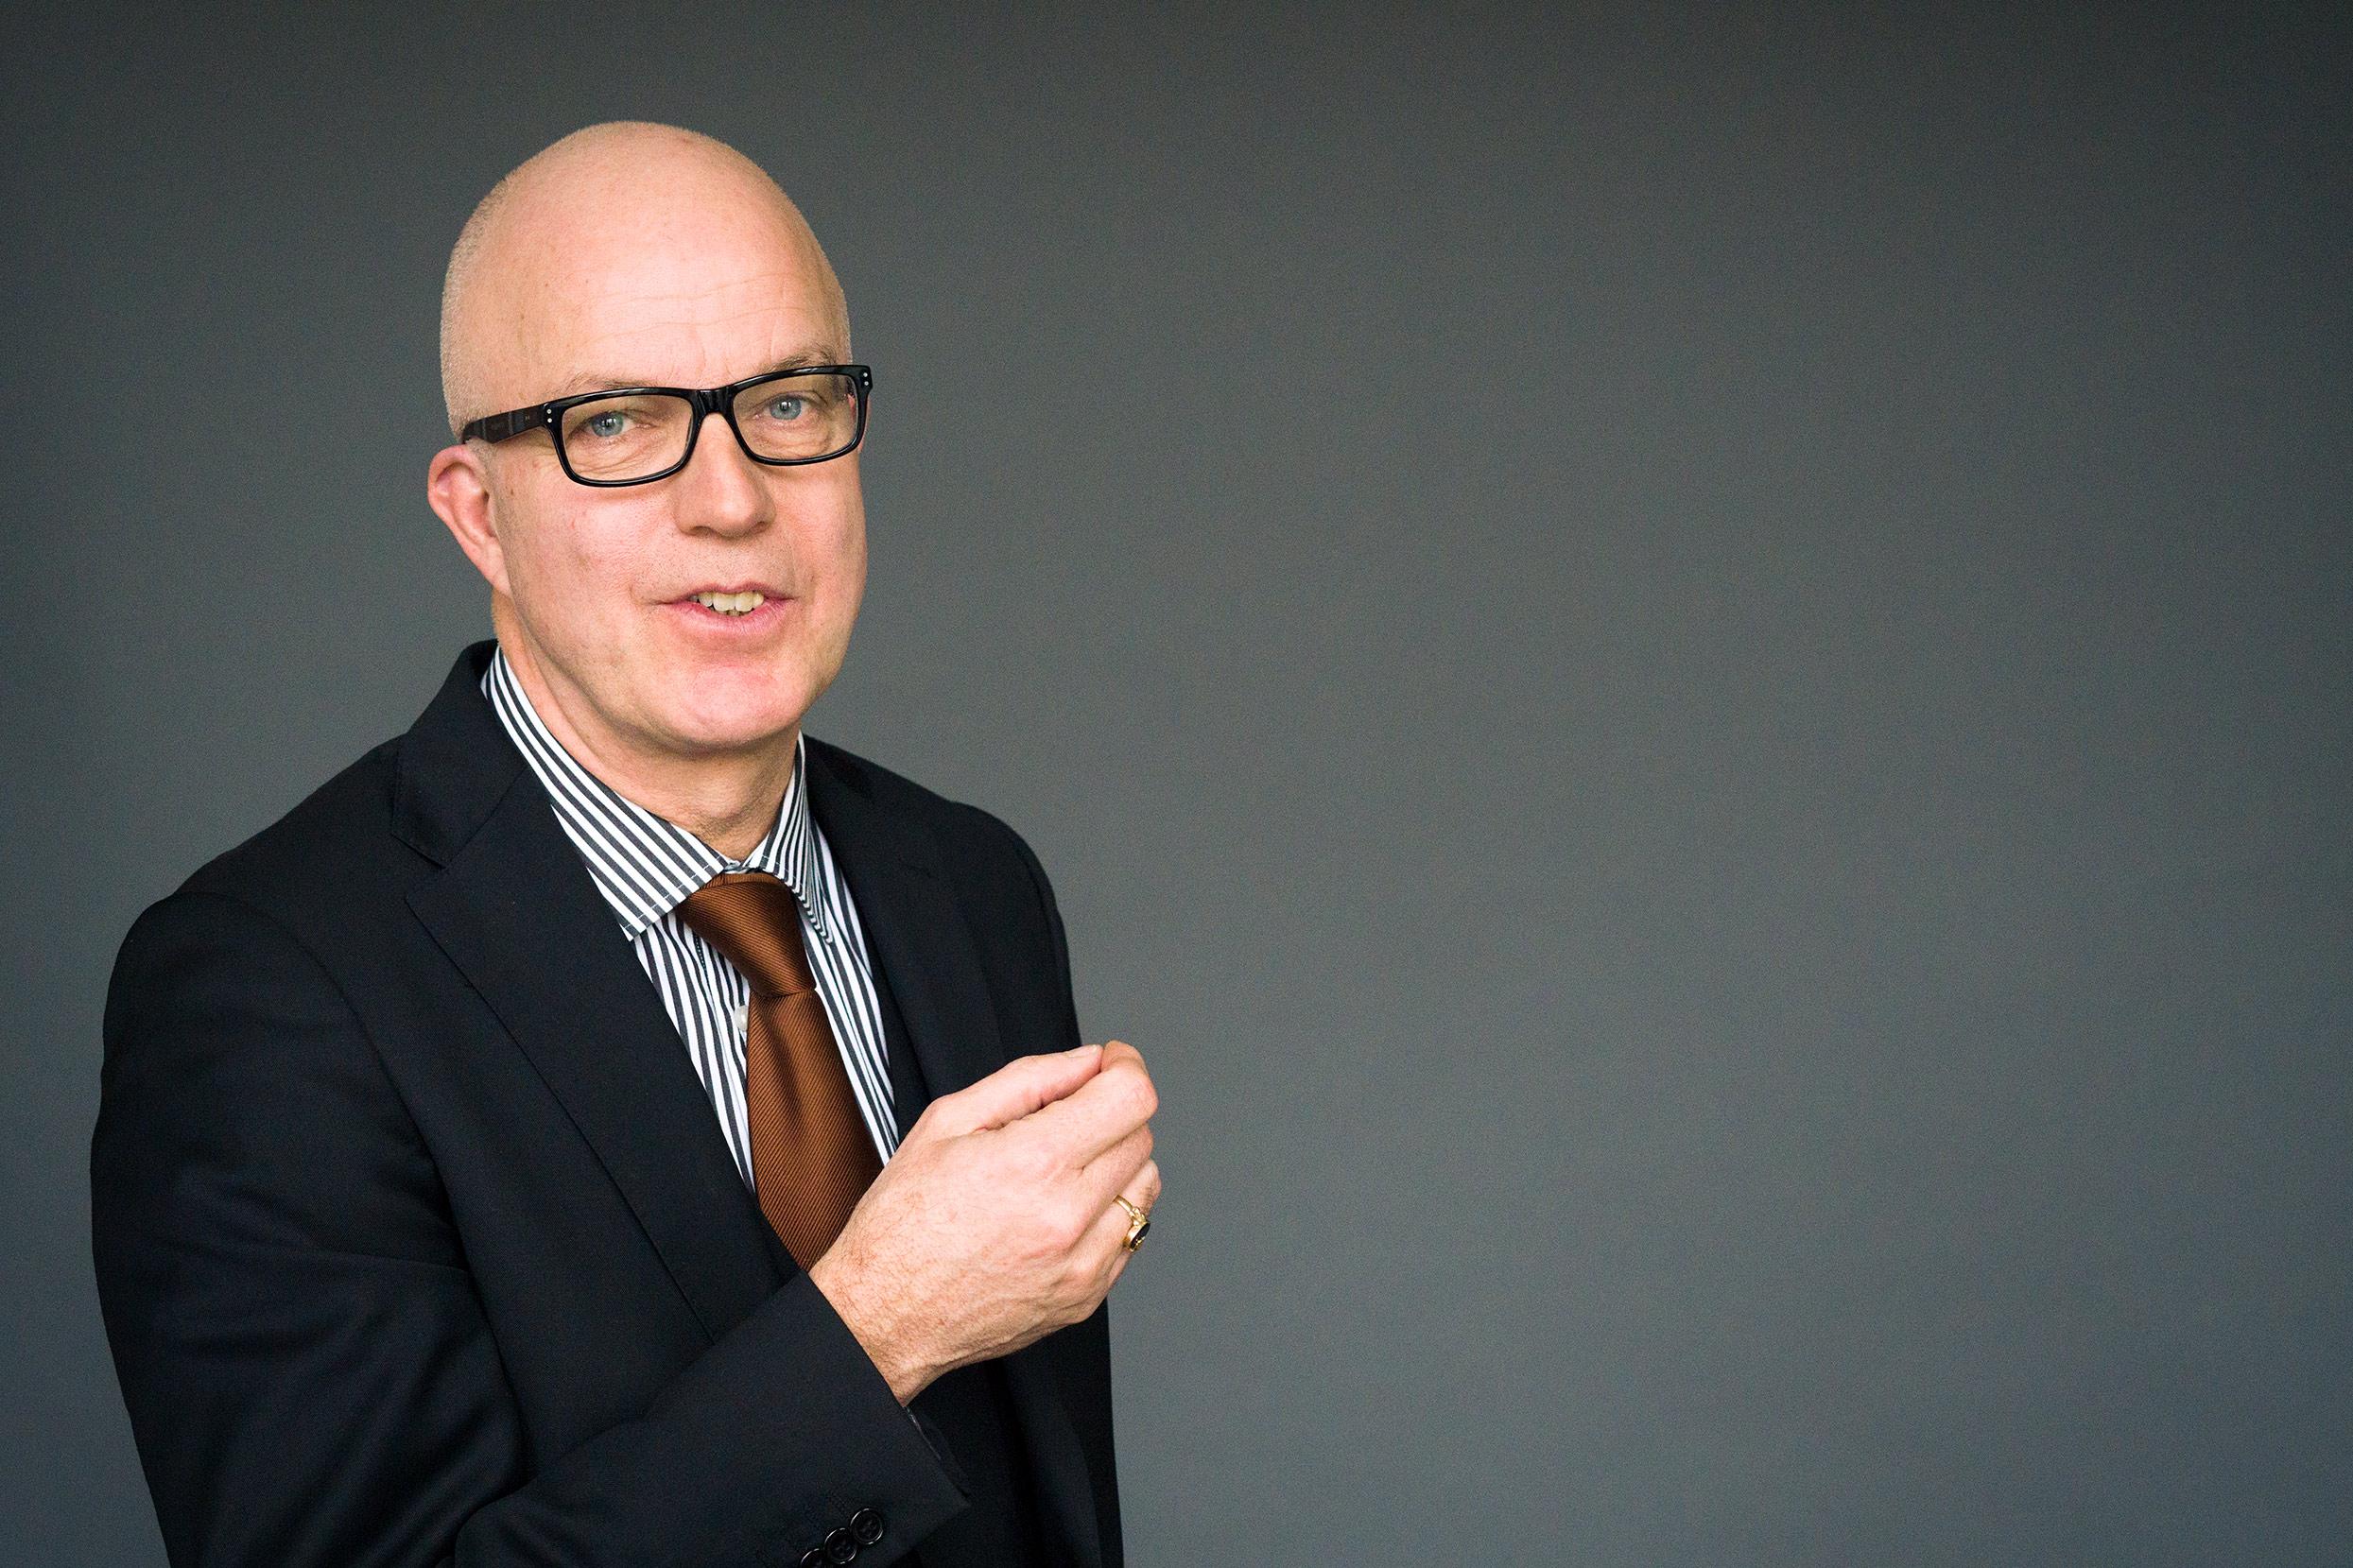 Portret cvb-voorzitter Ron Bormans